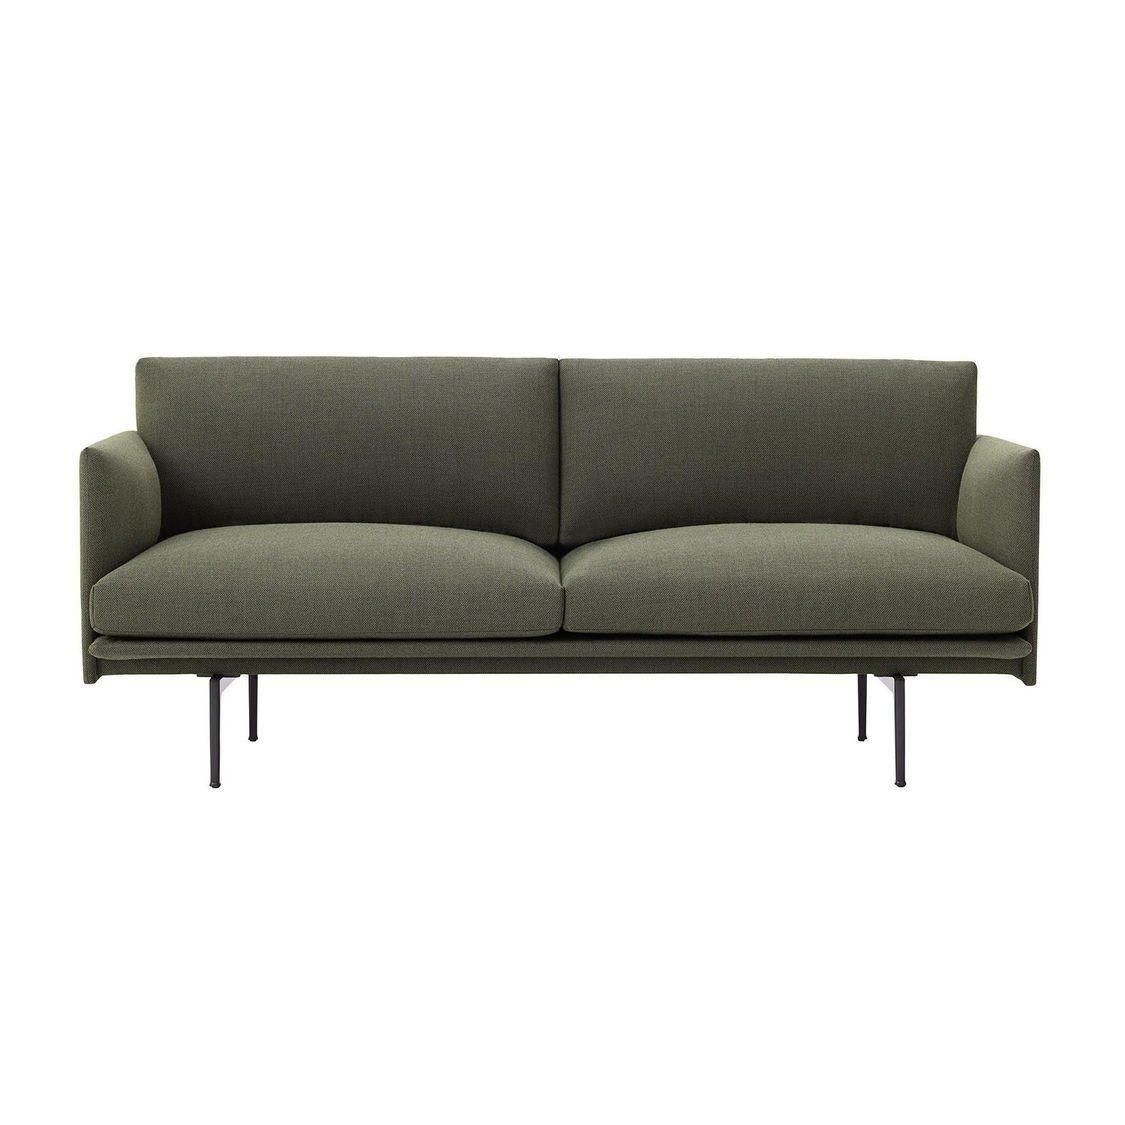 outline sofa 2 sitzer muuto. Black Bedroom Furniture Sets. Home Design Ideas